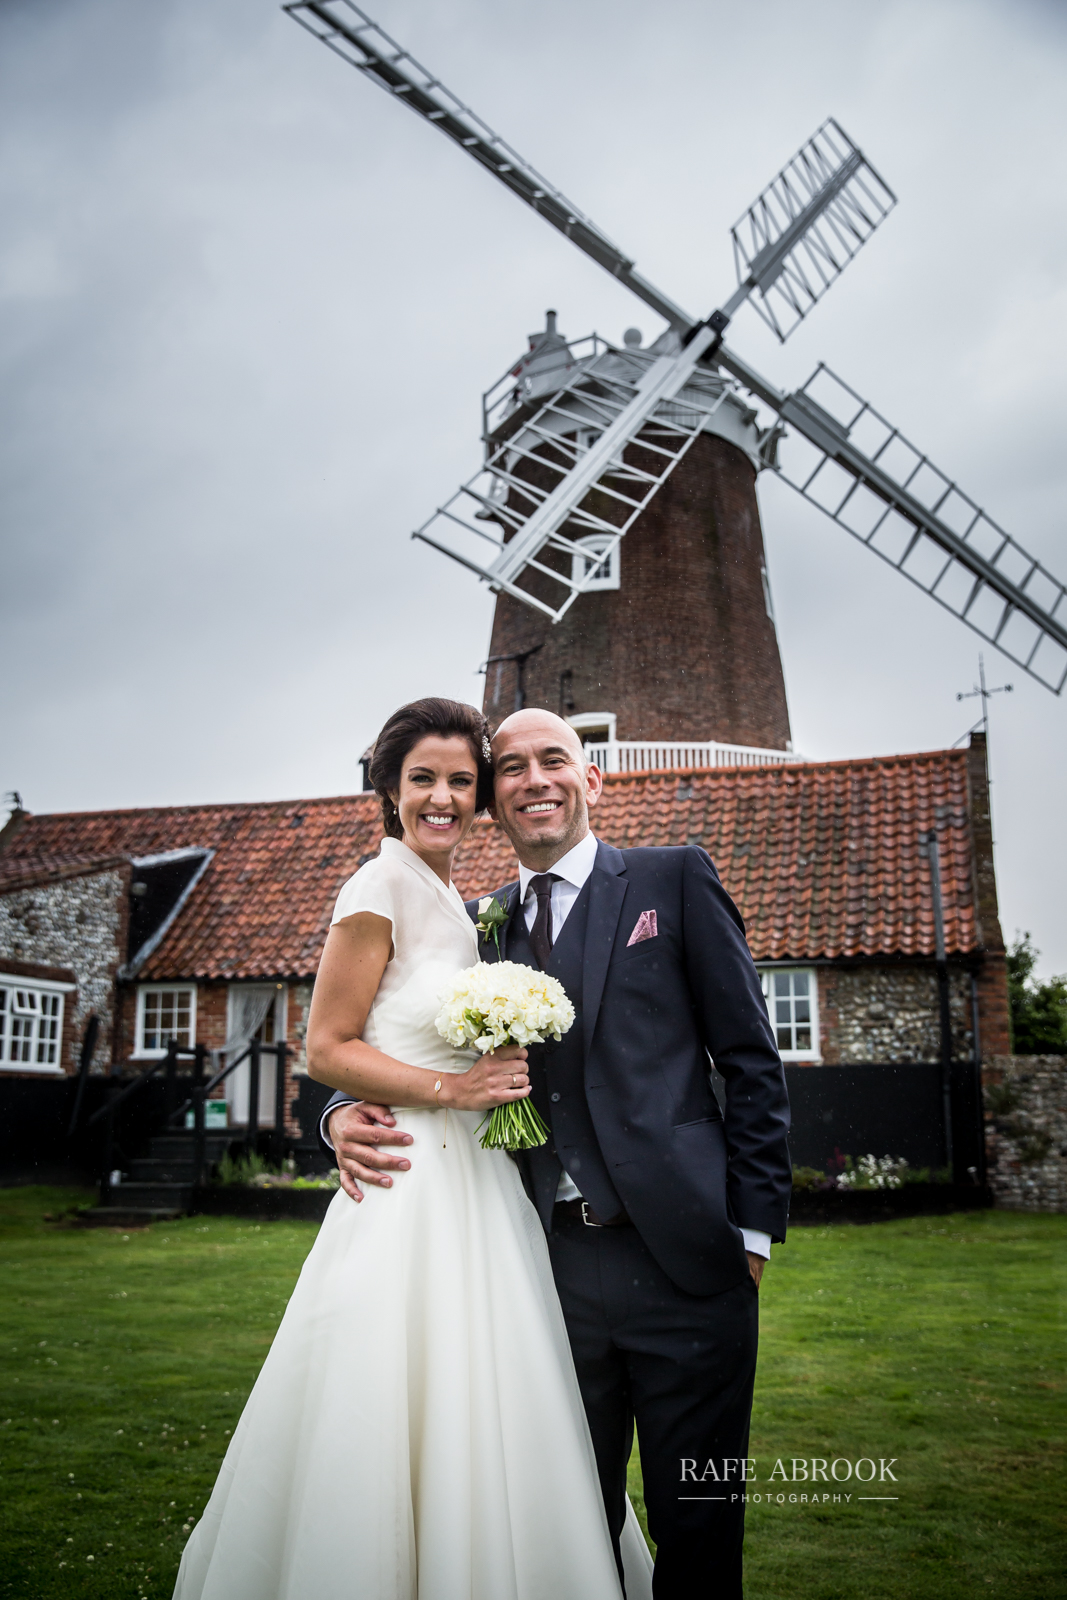 cley windmill wedding norfolk hertfordshire wedding photographer-1219.jpg